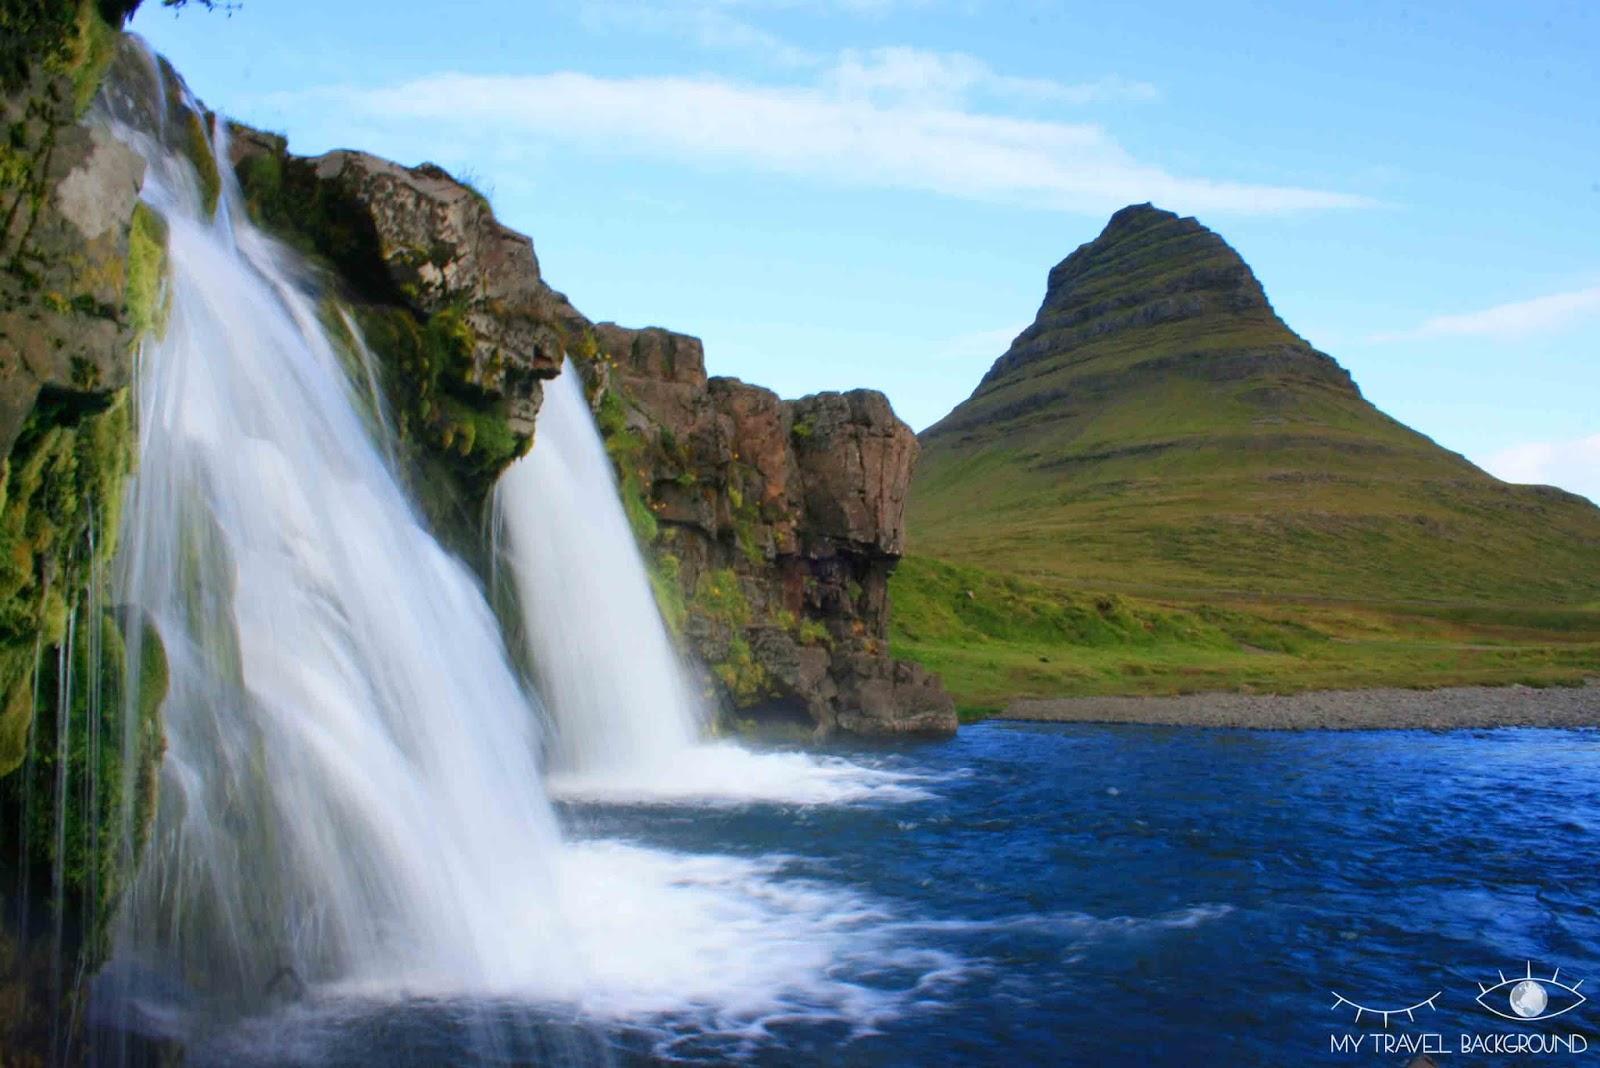 My Travel Background : Road Trip en Islande, itinéraire et infos pratiques / Mont Kirkjufell